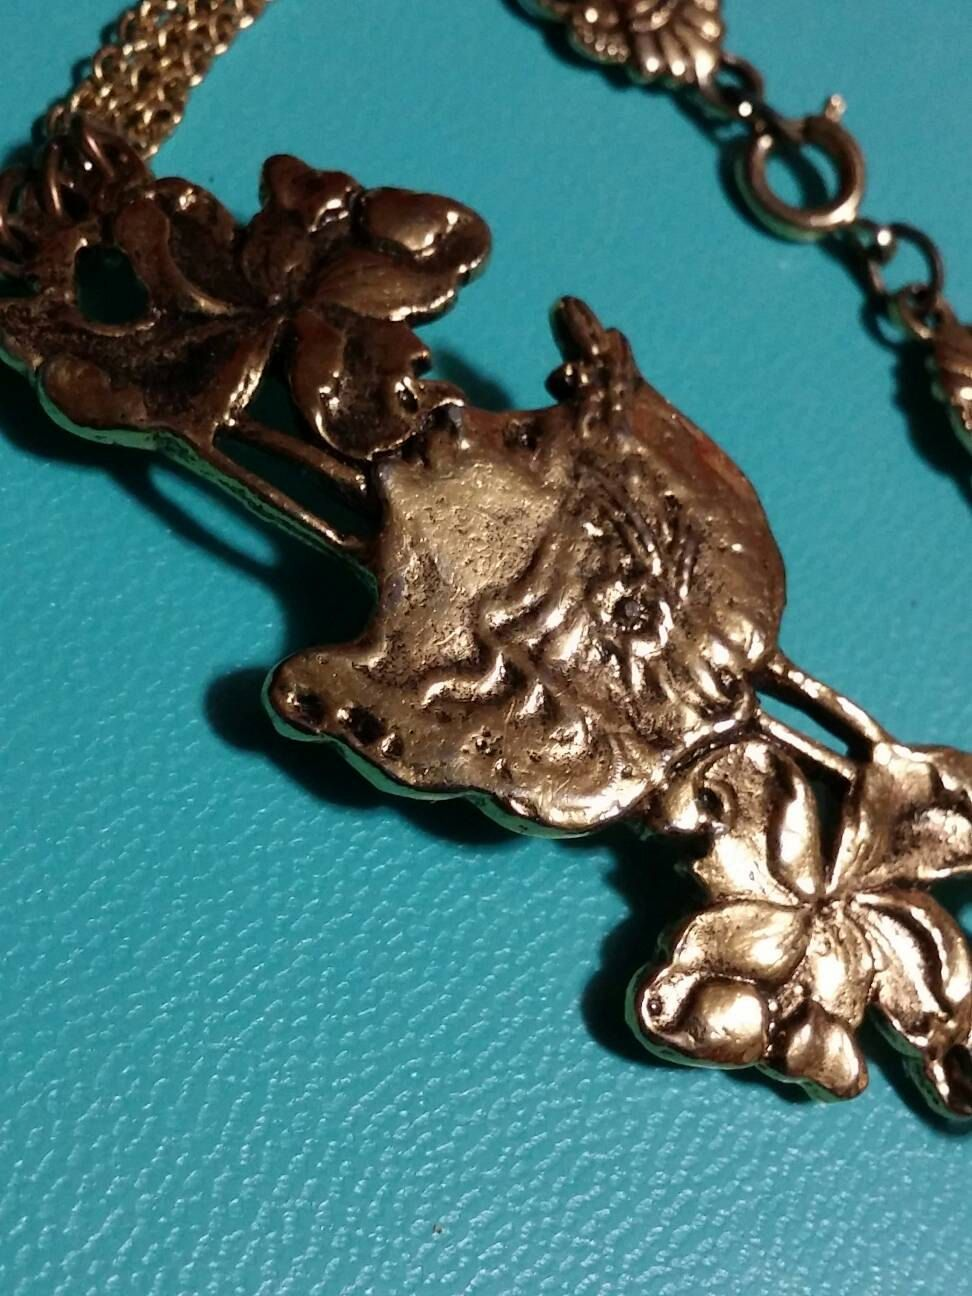 Art Nouveau bracelet Gold Tone Girl art nouveau bracelet lady pretty bracelet gold tone decorative vintage find i want one love this bracelet one for collection hi pretty lady classy bracelet 5.99 USD #goriani